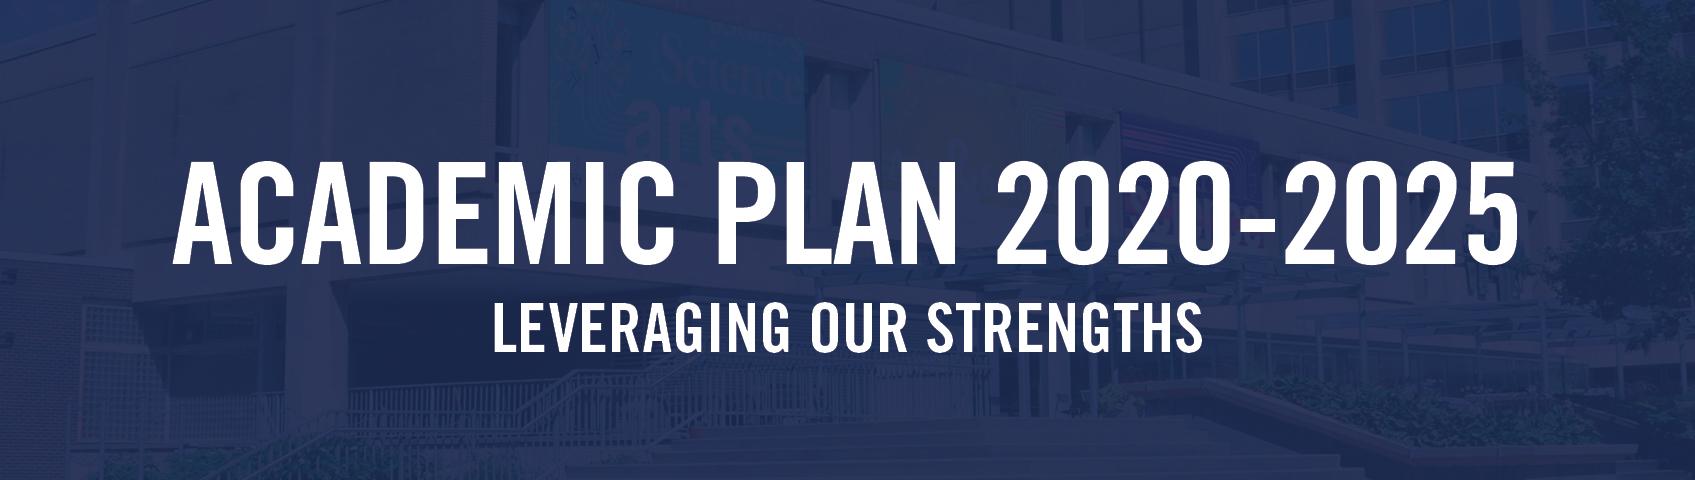 Academic Plan Banner